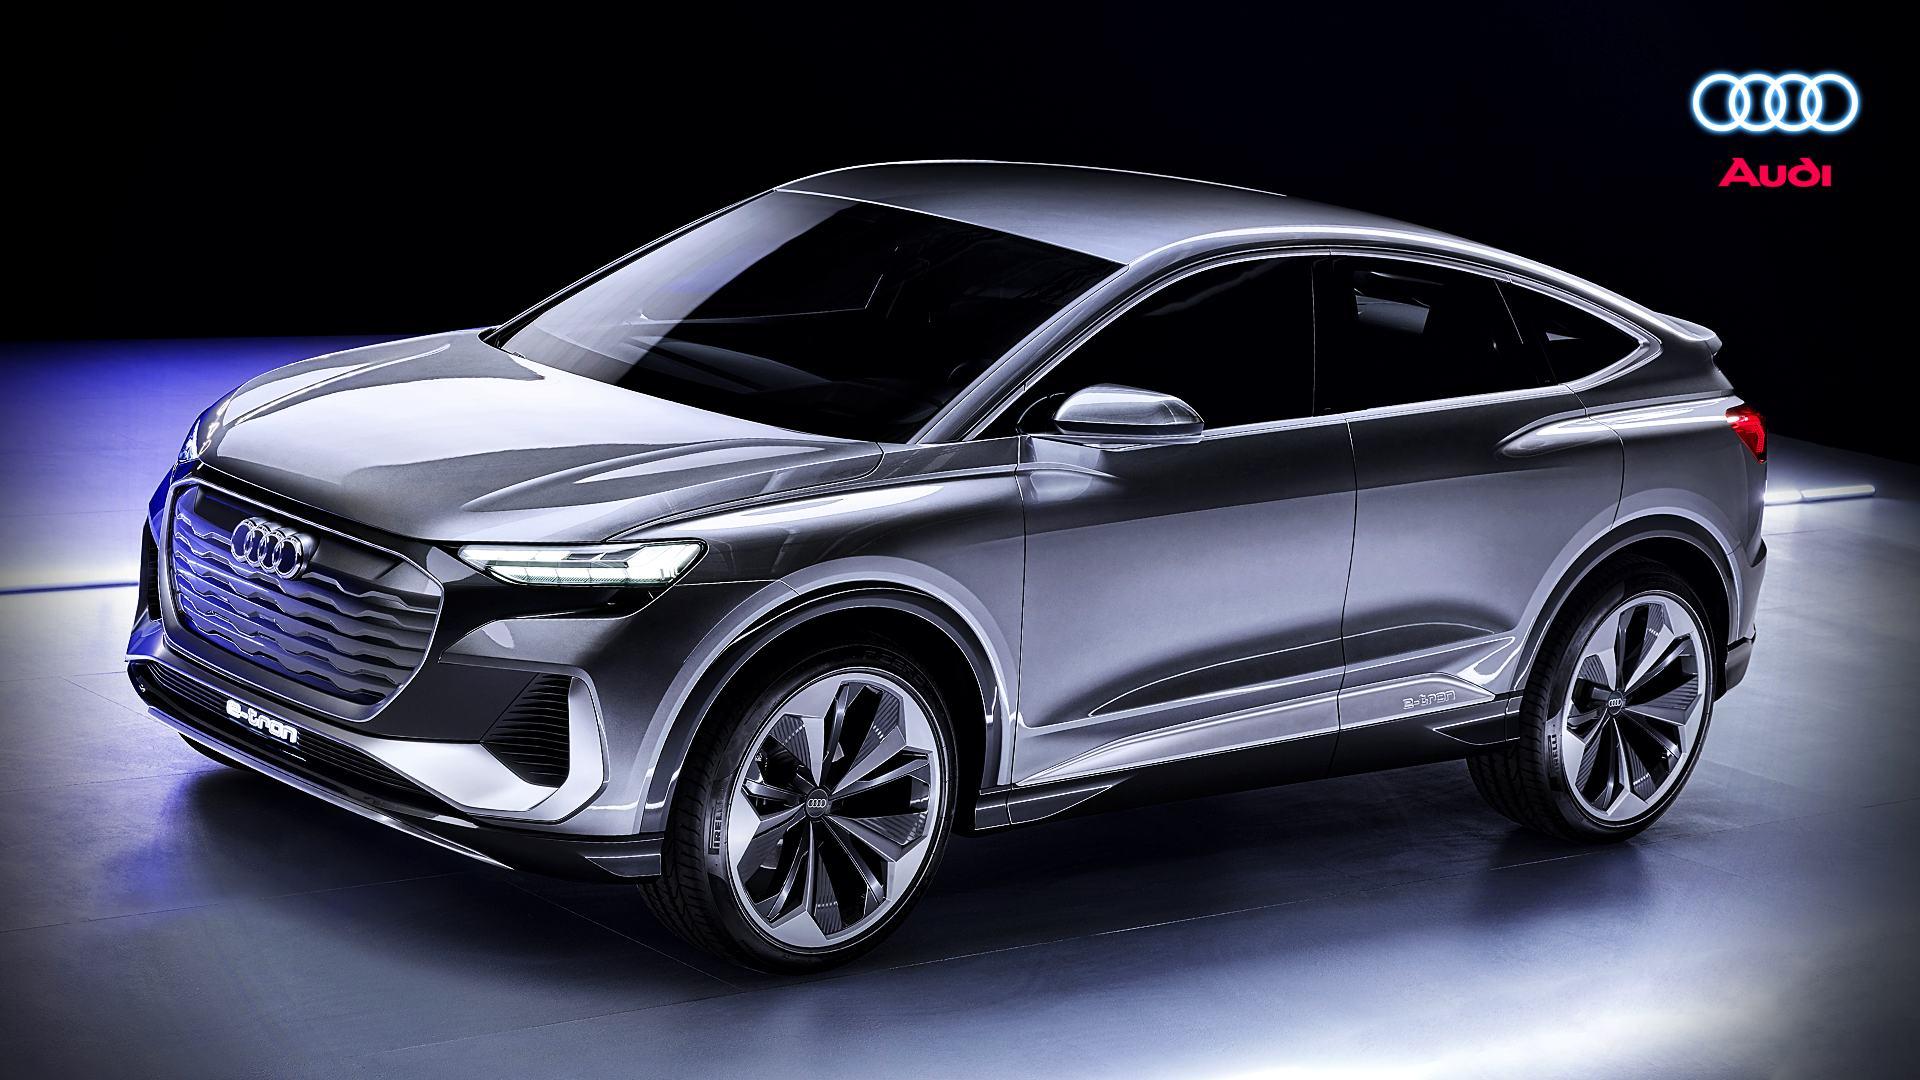 2021 Audi Q4 Suv E Tron Electric Car